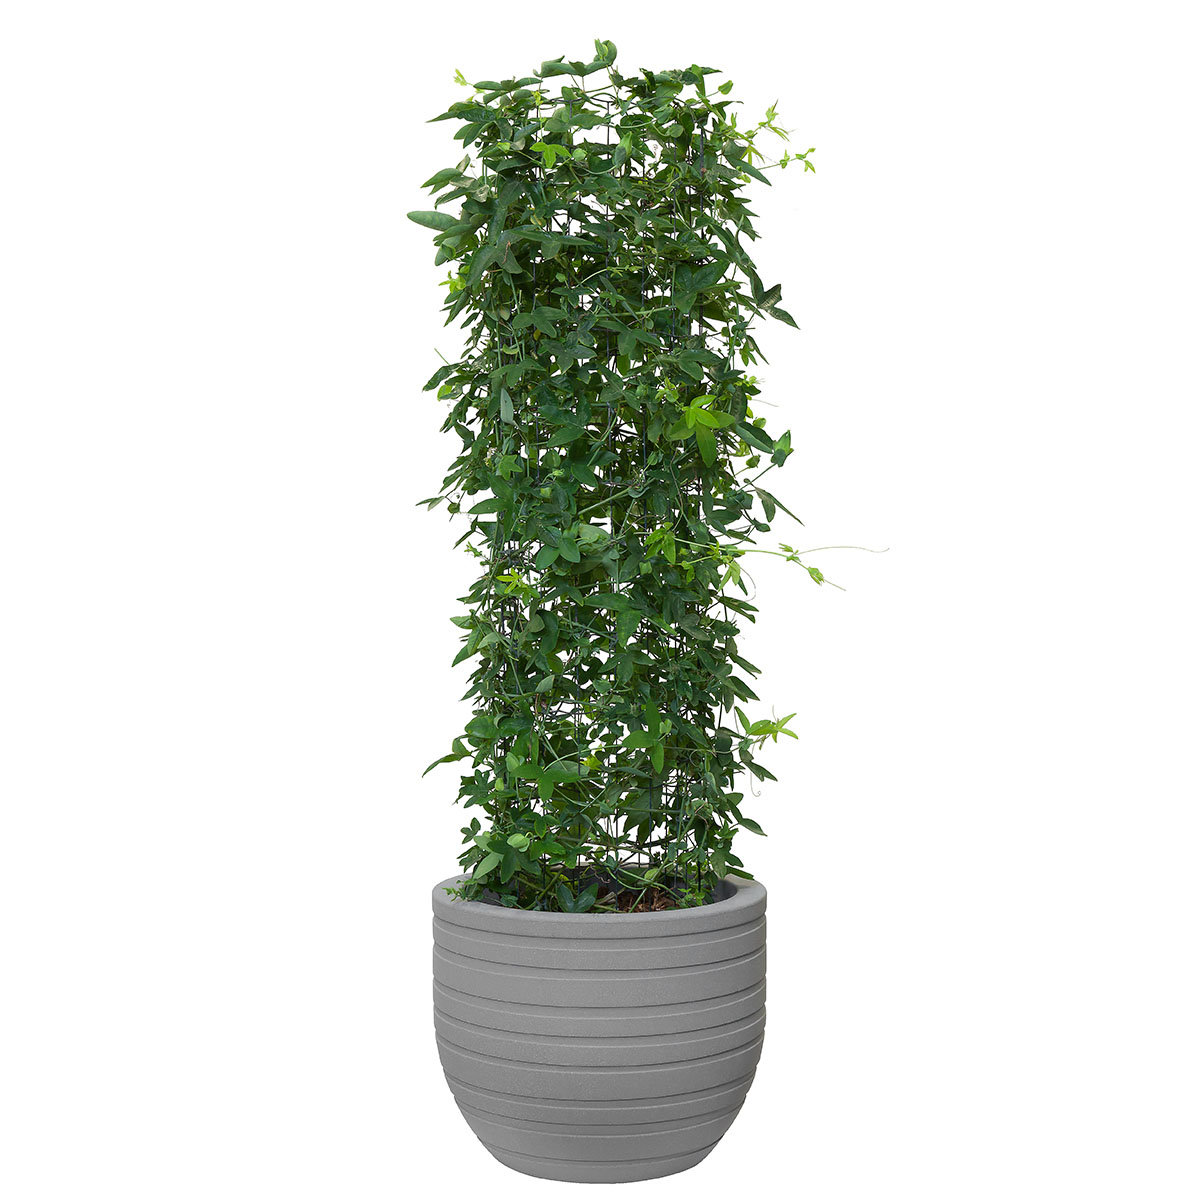 elho pflanzkübel ribbon, grau, 47cm online kaufen bei gärtner pötschke